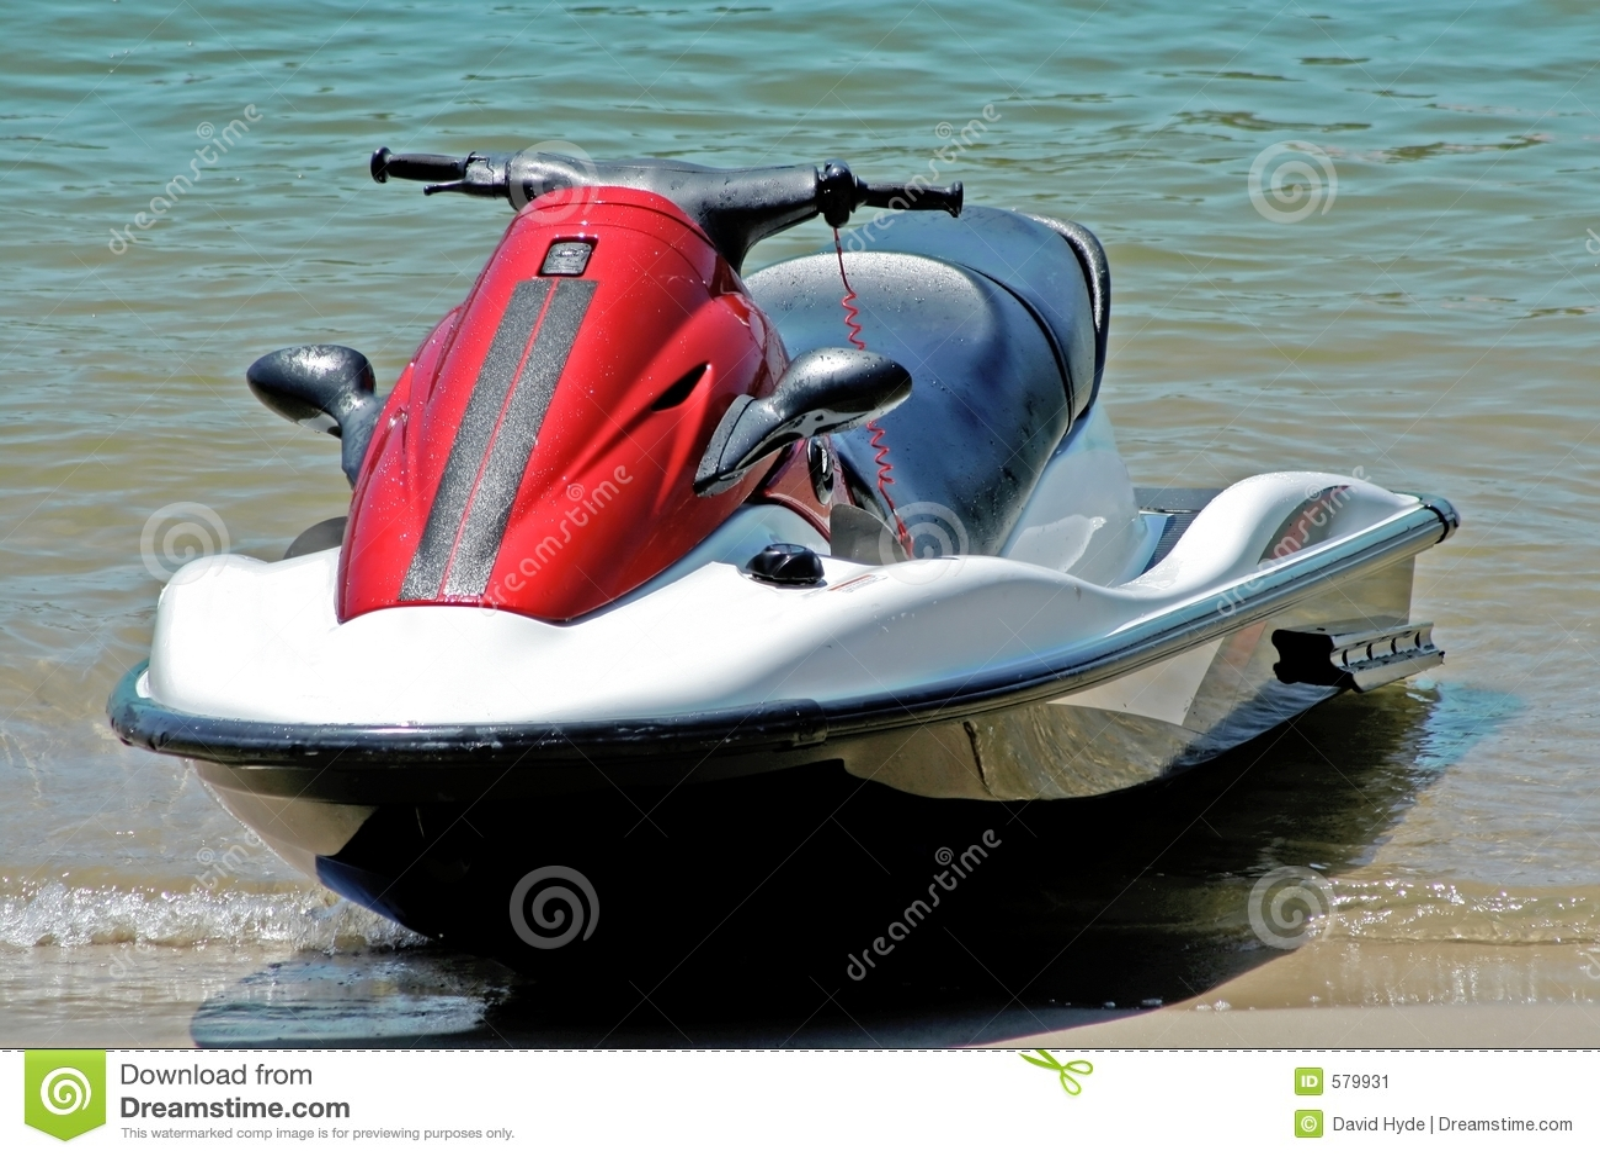 Suzuki Personal Watercraft